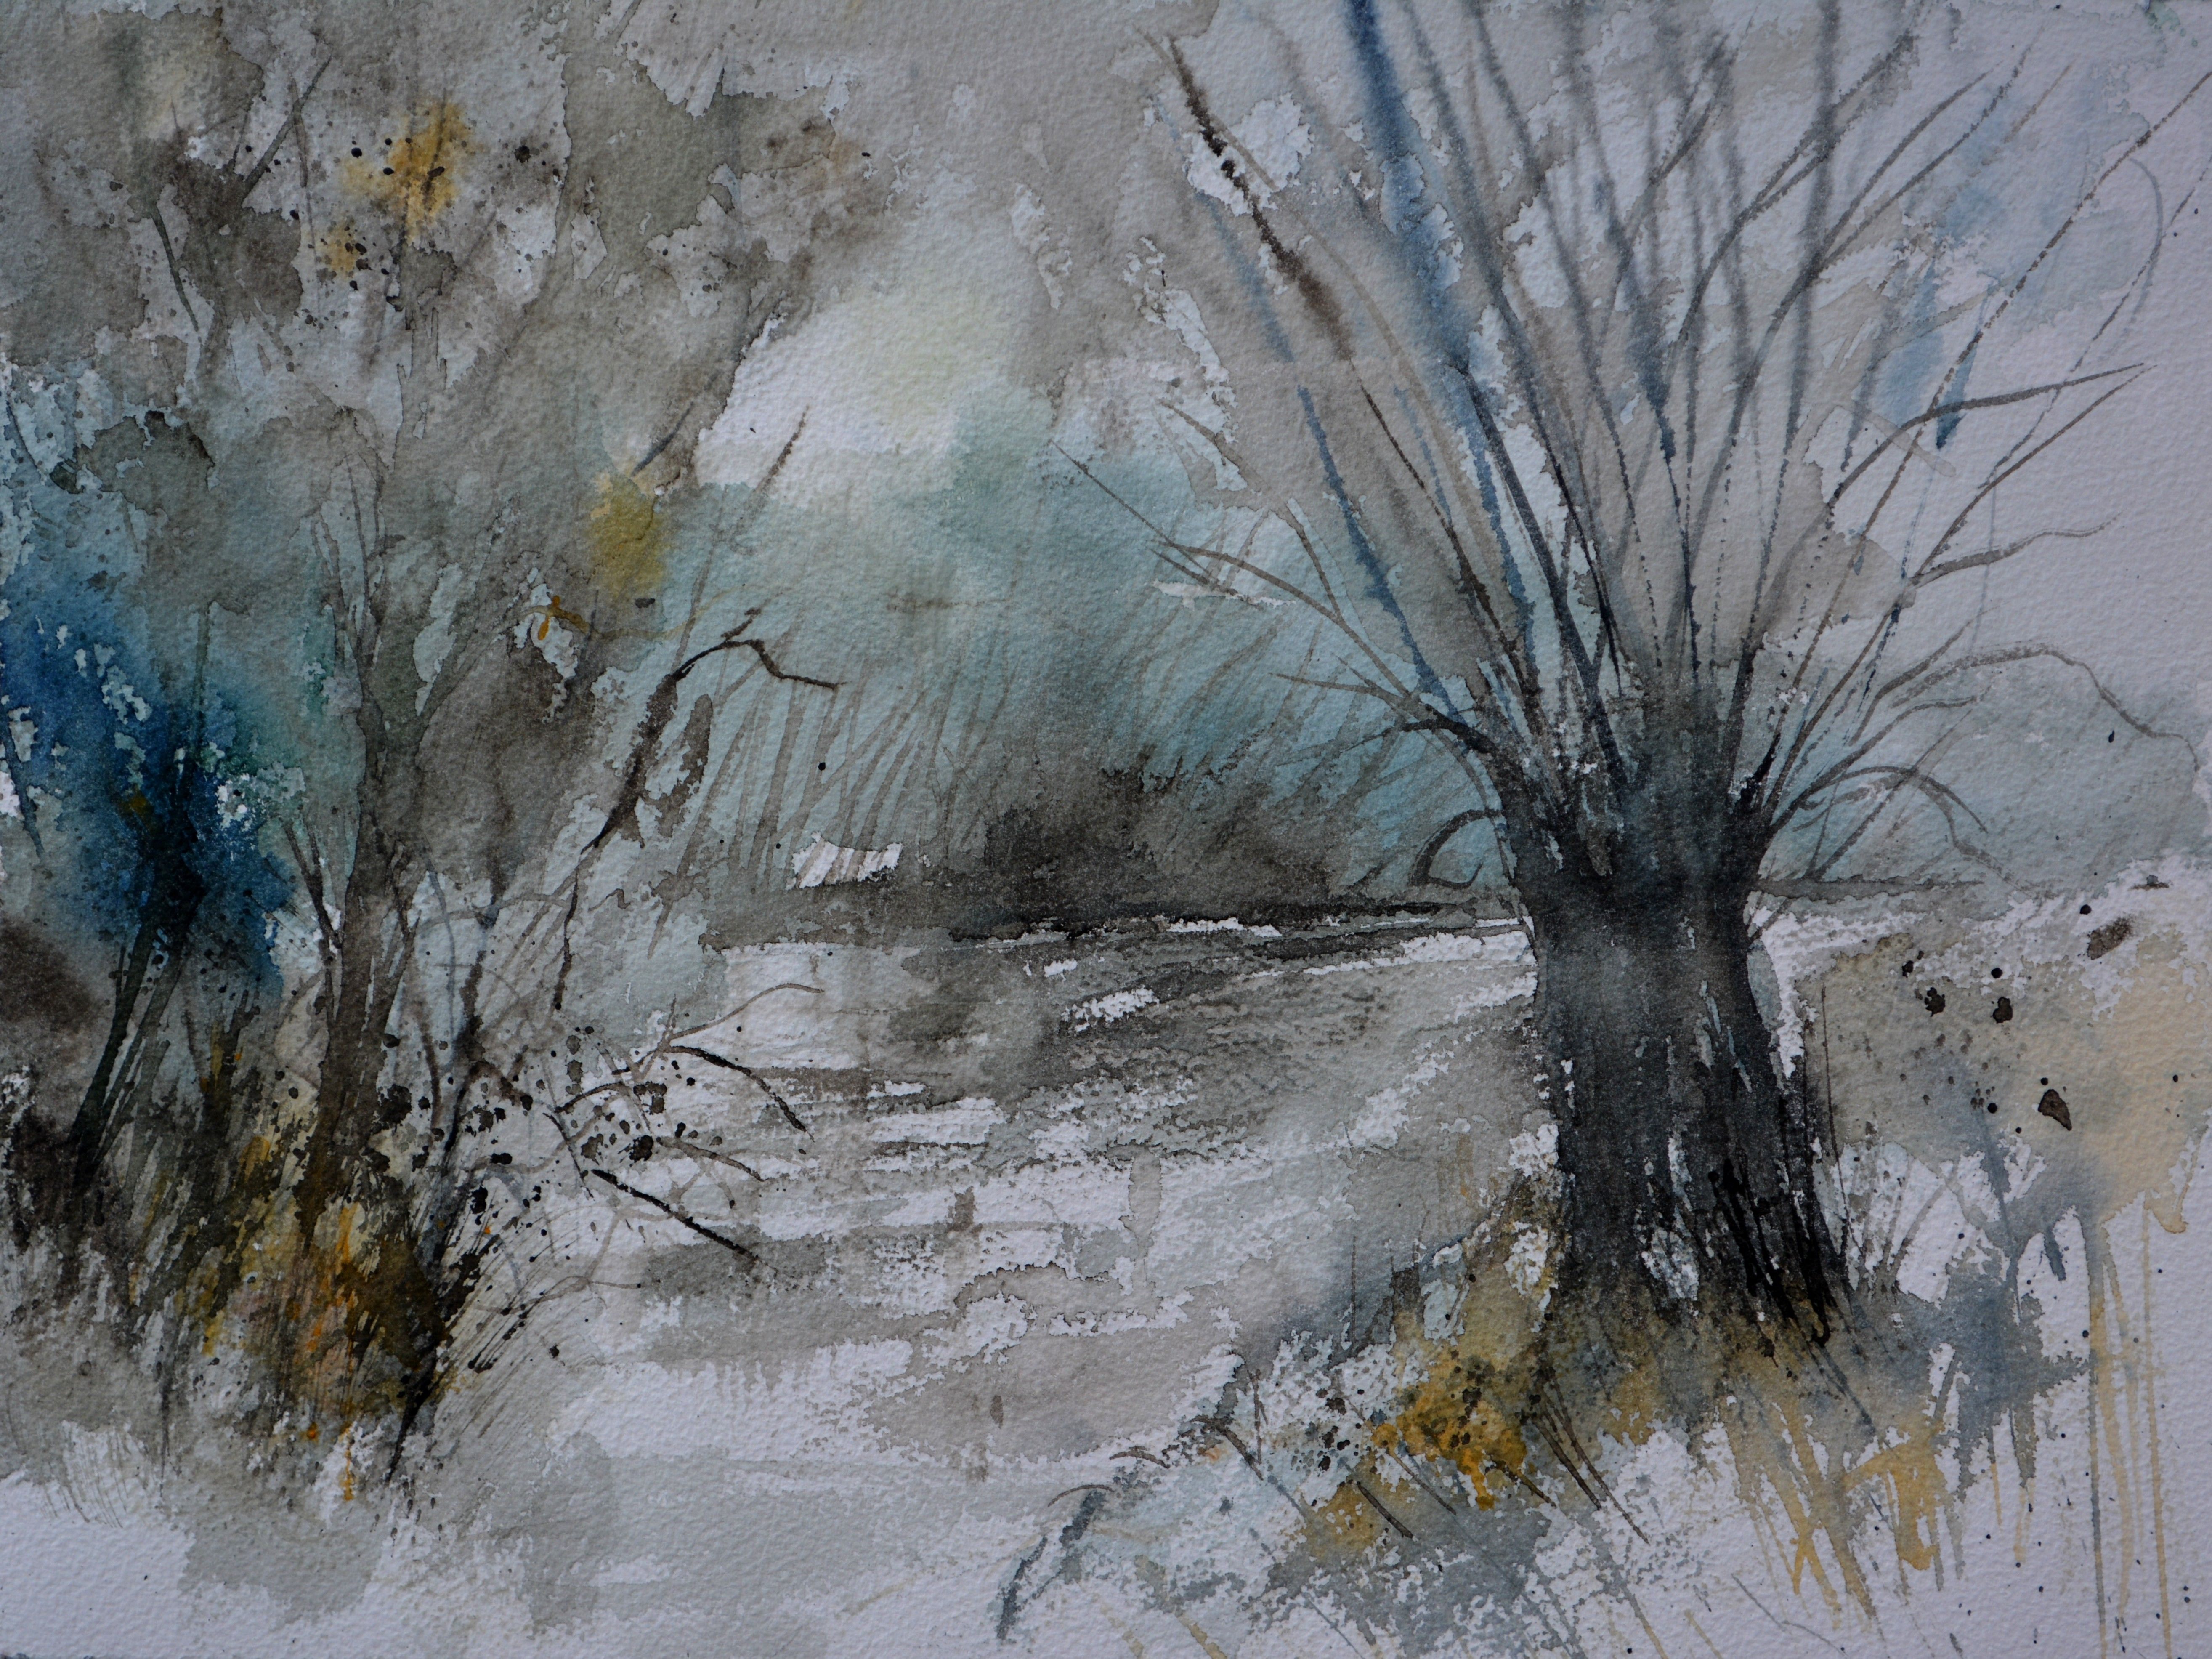 Original watercolor art for sale - Pol Ledent Artwork Watercolor 71101 For Sale And Offering More Original Artworks In Textile Medium And Landscape Theme